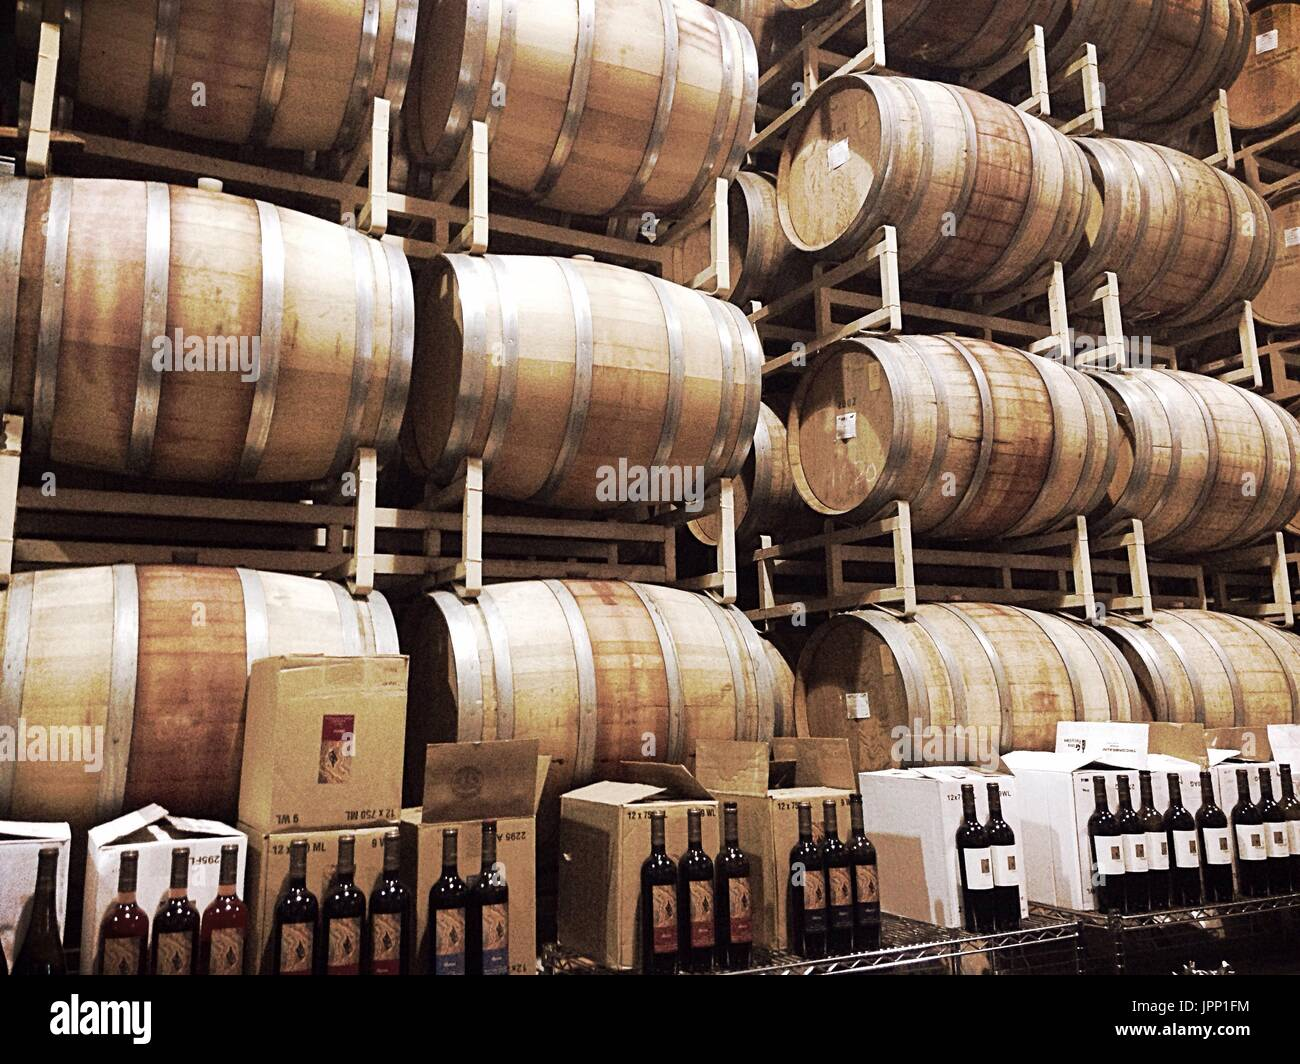 barrel - Stock Image